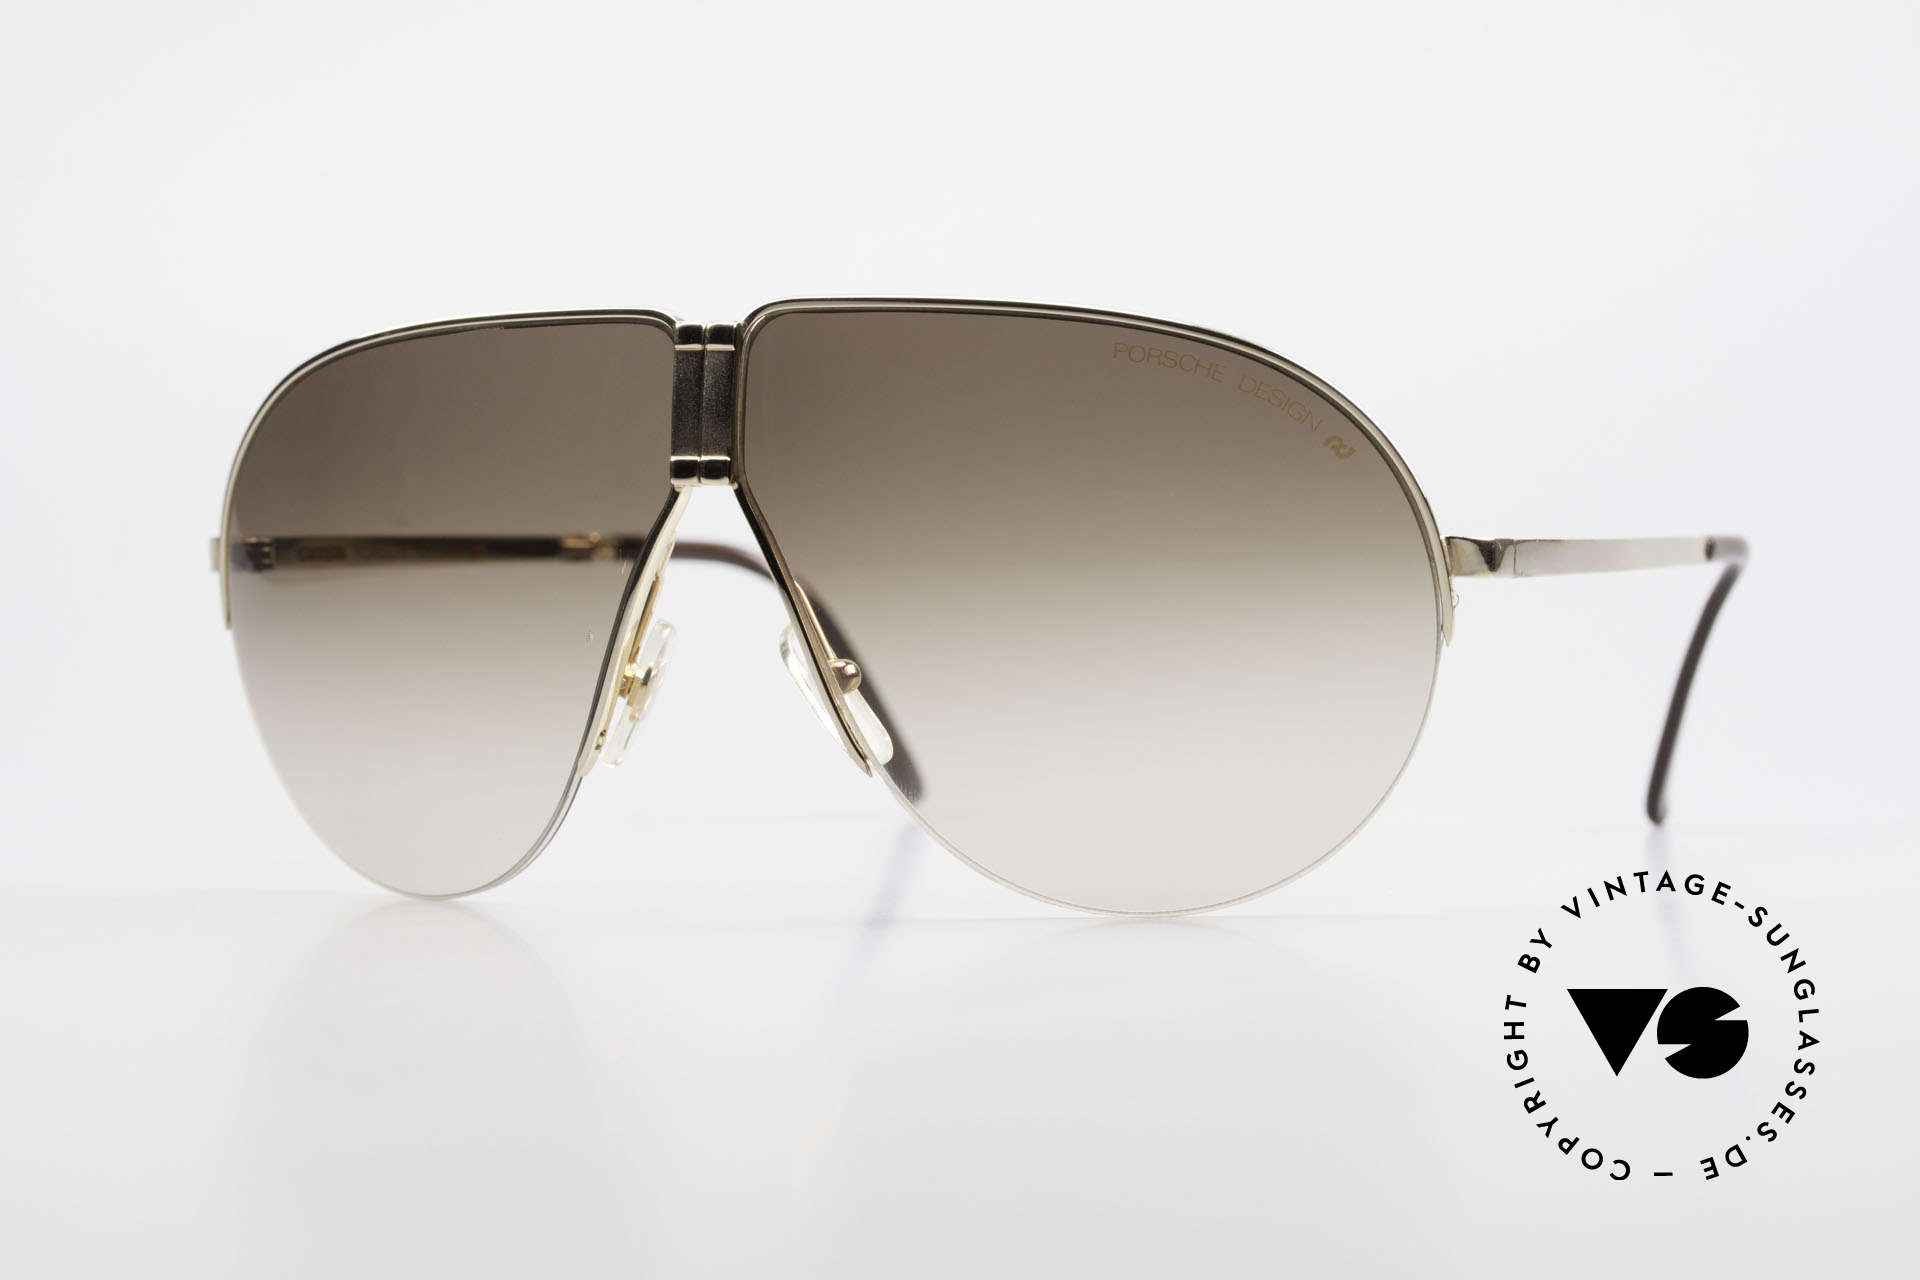 Porsche 5628 Rare 80's Folding Sunglasses, practical PORSCHE folding 1980's vintage sunglasses, Made for Men